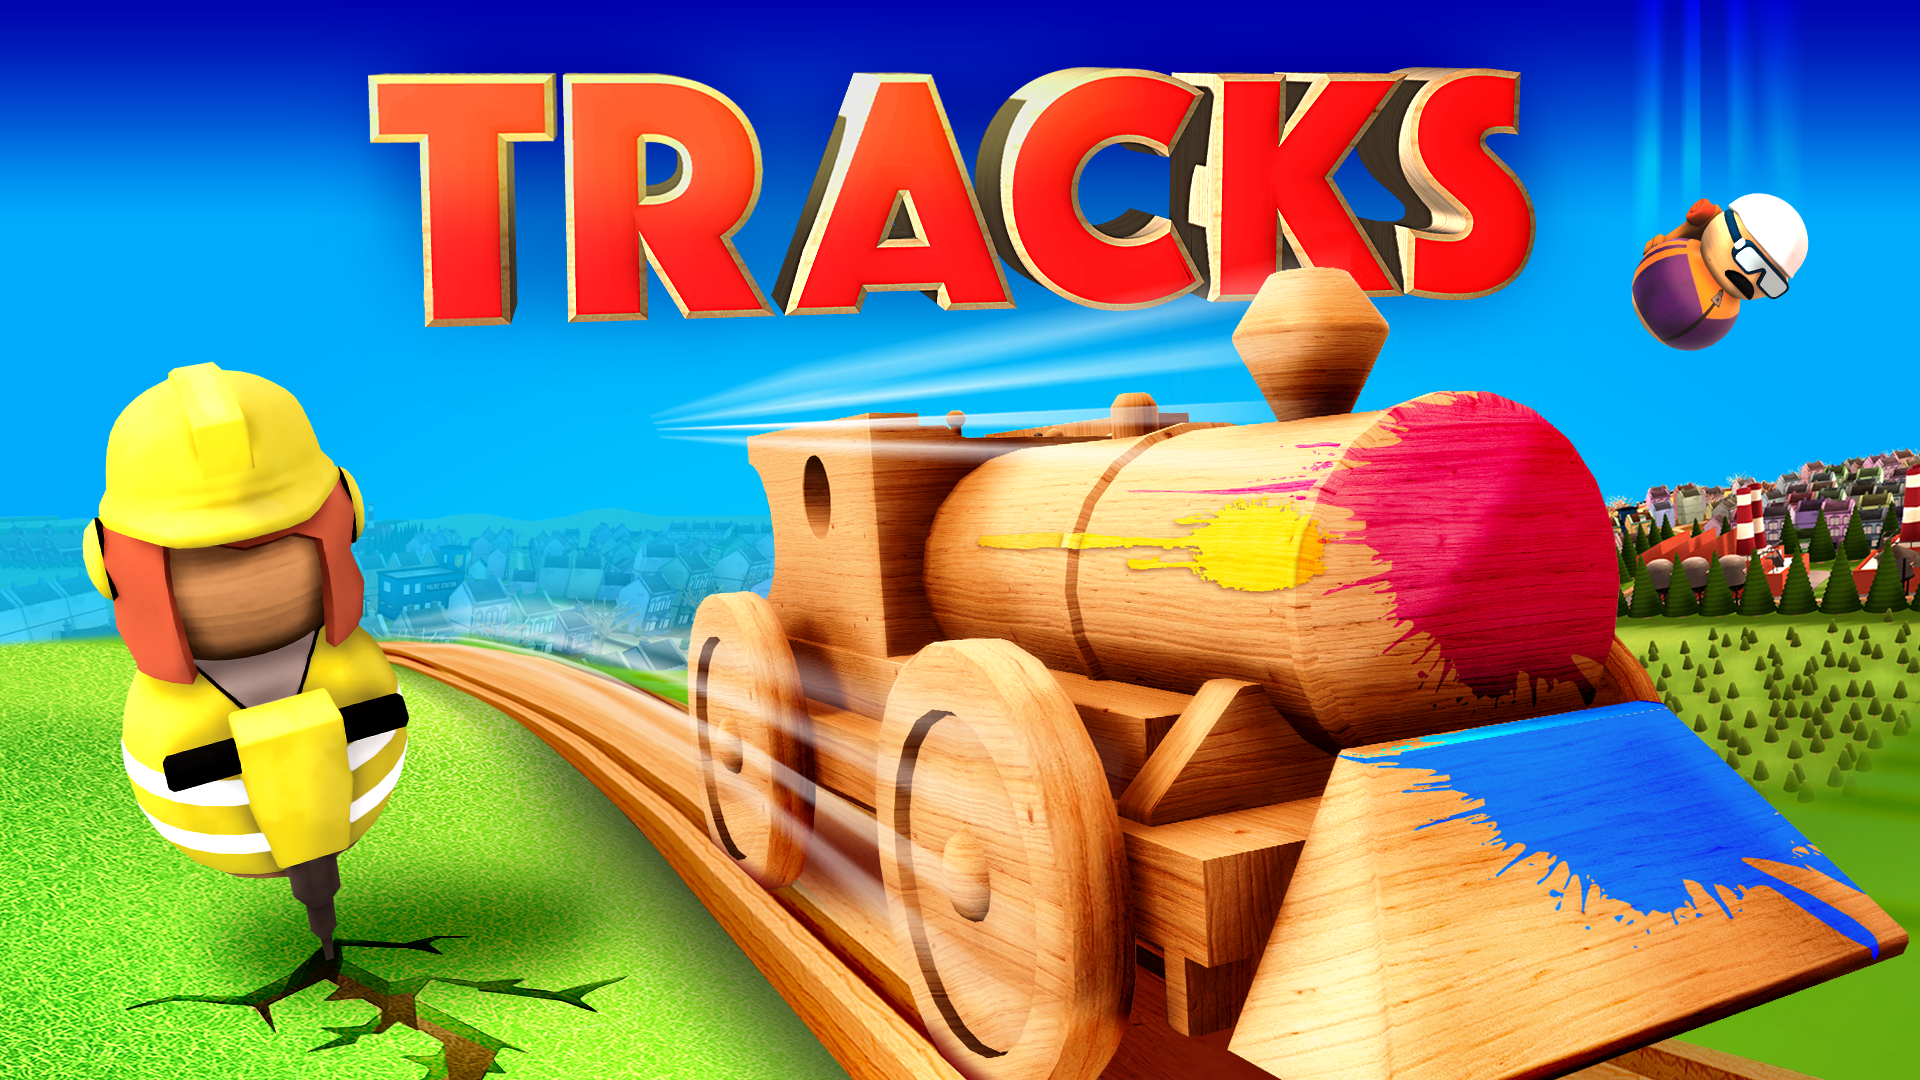 Tracks Title Hero Art